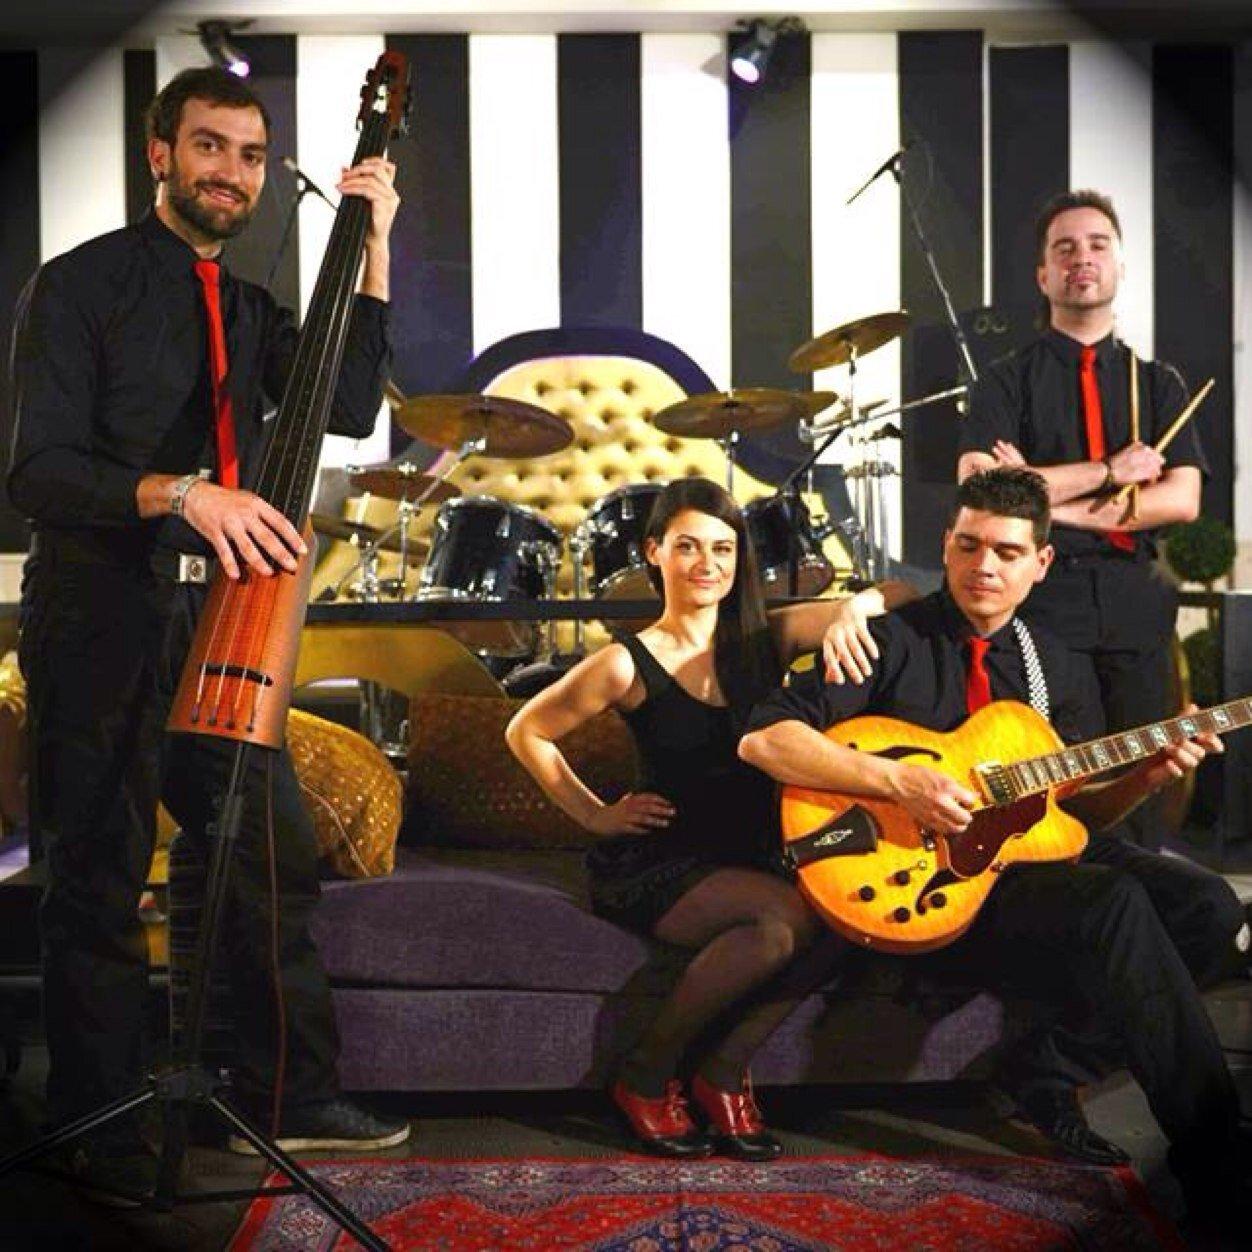 El swing de Radio Lulú celebra las fiestas de Molinaseca en La Filomena 1